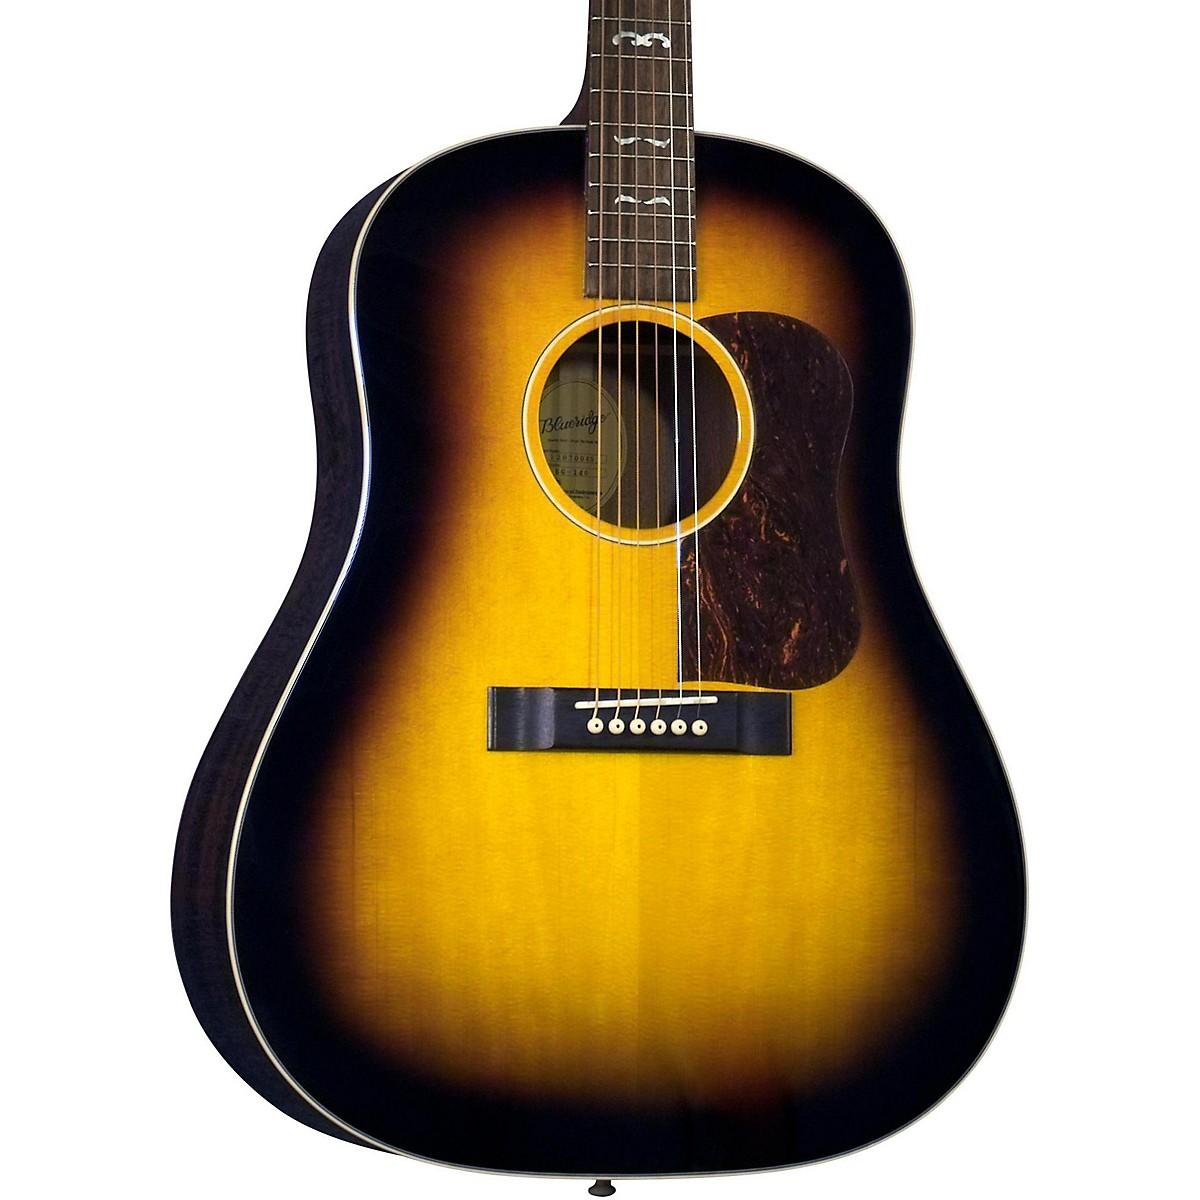 Blueridge Historic Series BG-140 Slope-Shoulder Dreadnought Acoustic Guitar